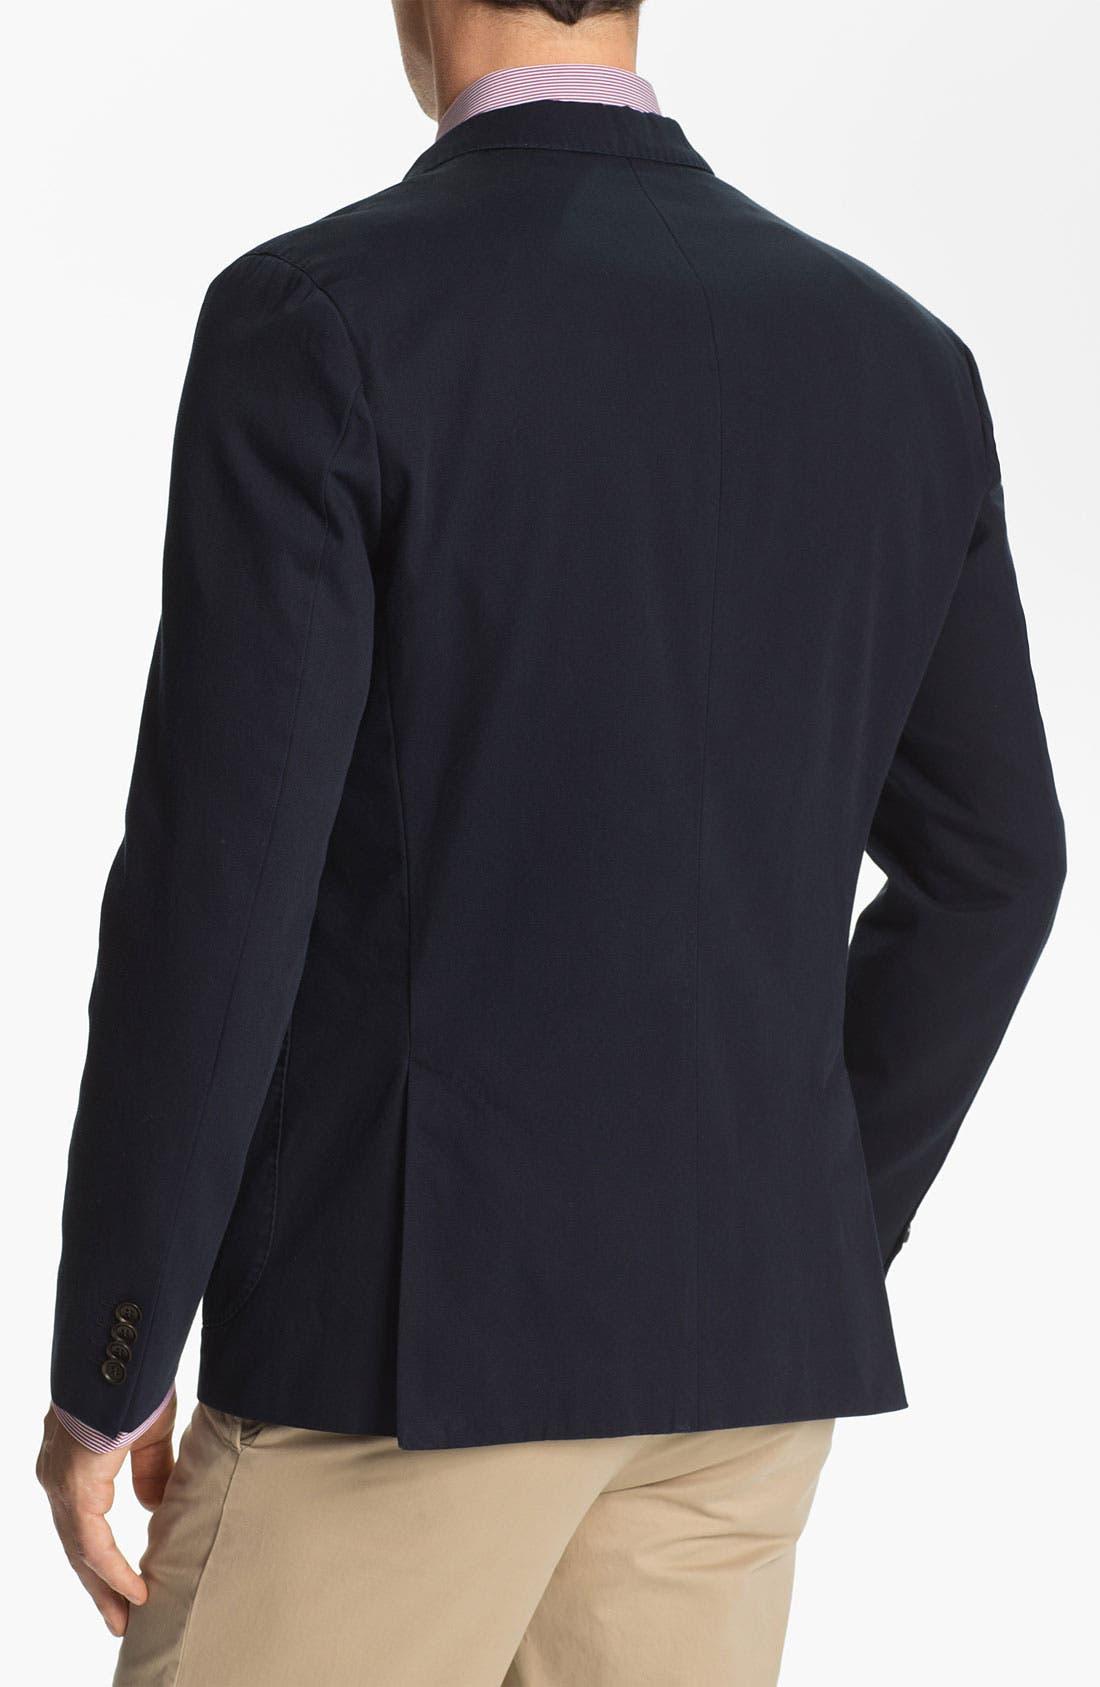 Alternate Image 2  - BOSS Black 'Raye' Trim Fit Three Button Blazer (Online Only)